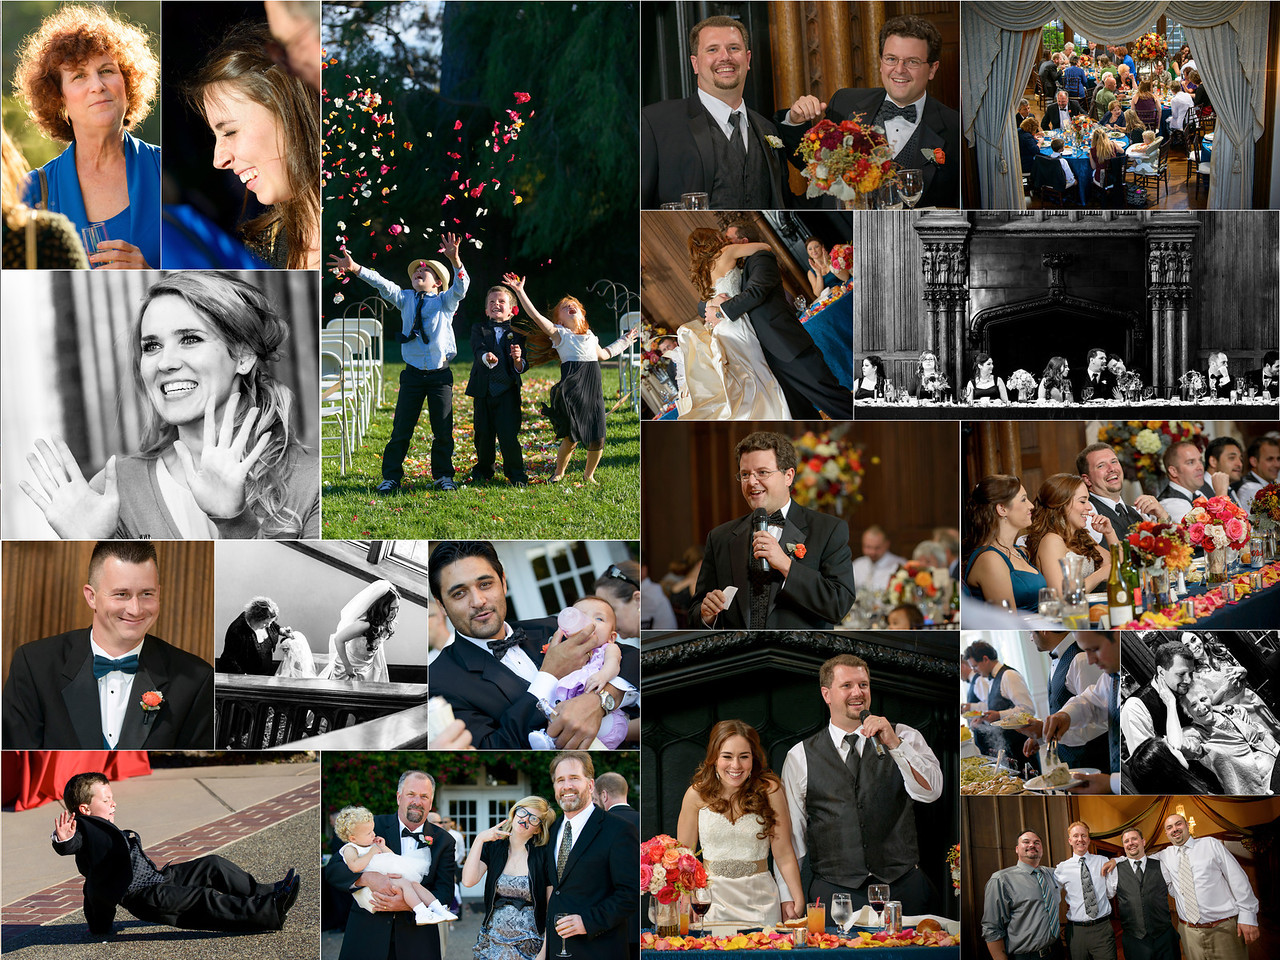 Danielle_and_Tony_Wedding_Photography_4x6_Photo_Board_05